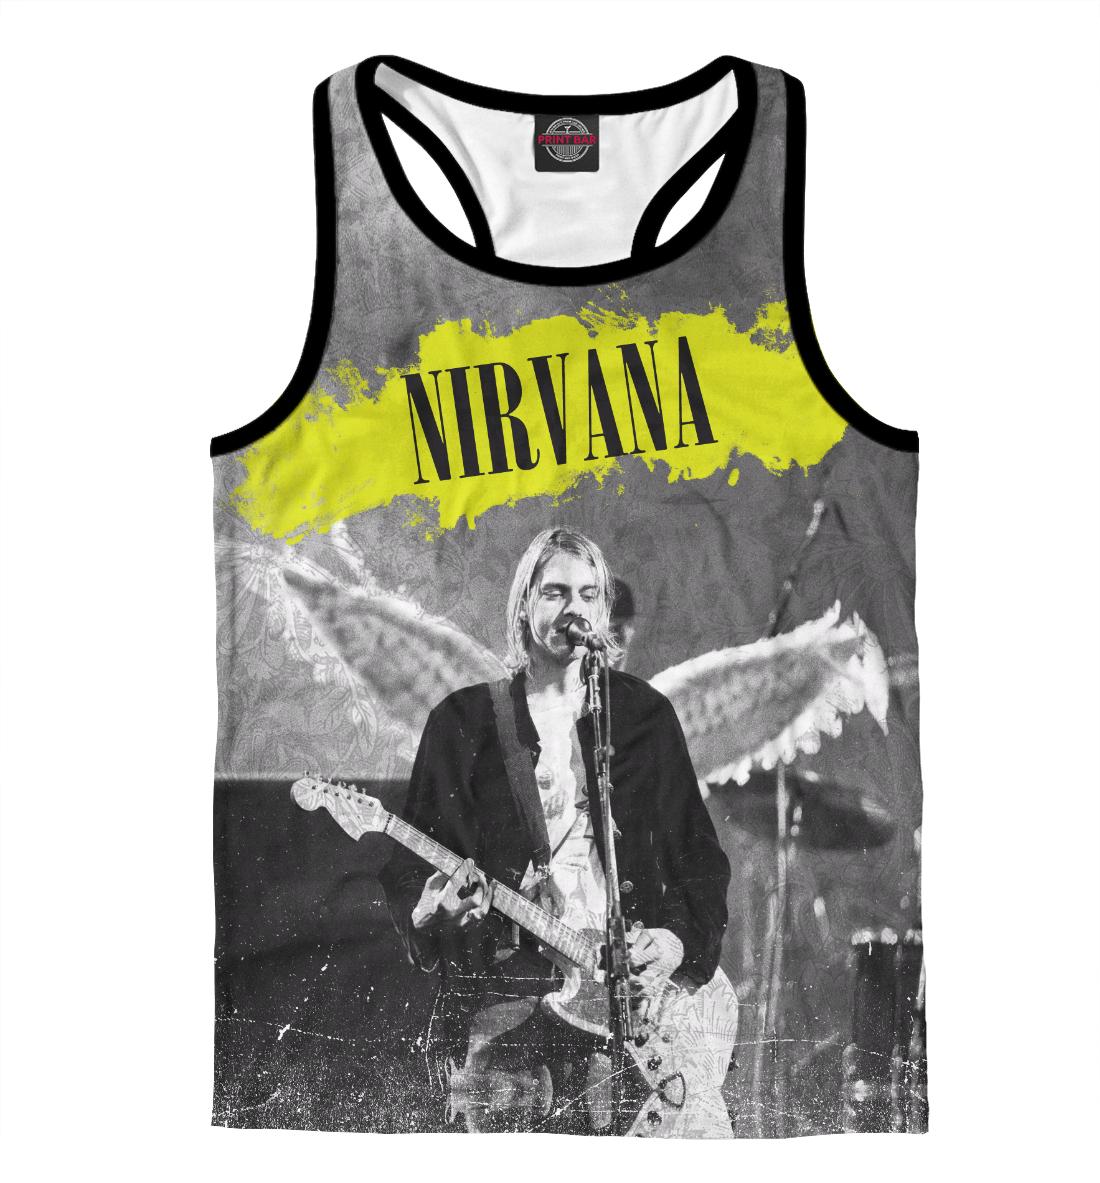 Купить Майка для мальчика Nirvana NIR-550069-mayb-2